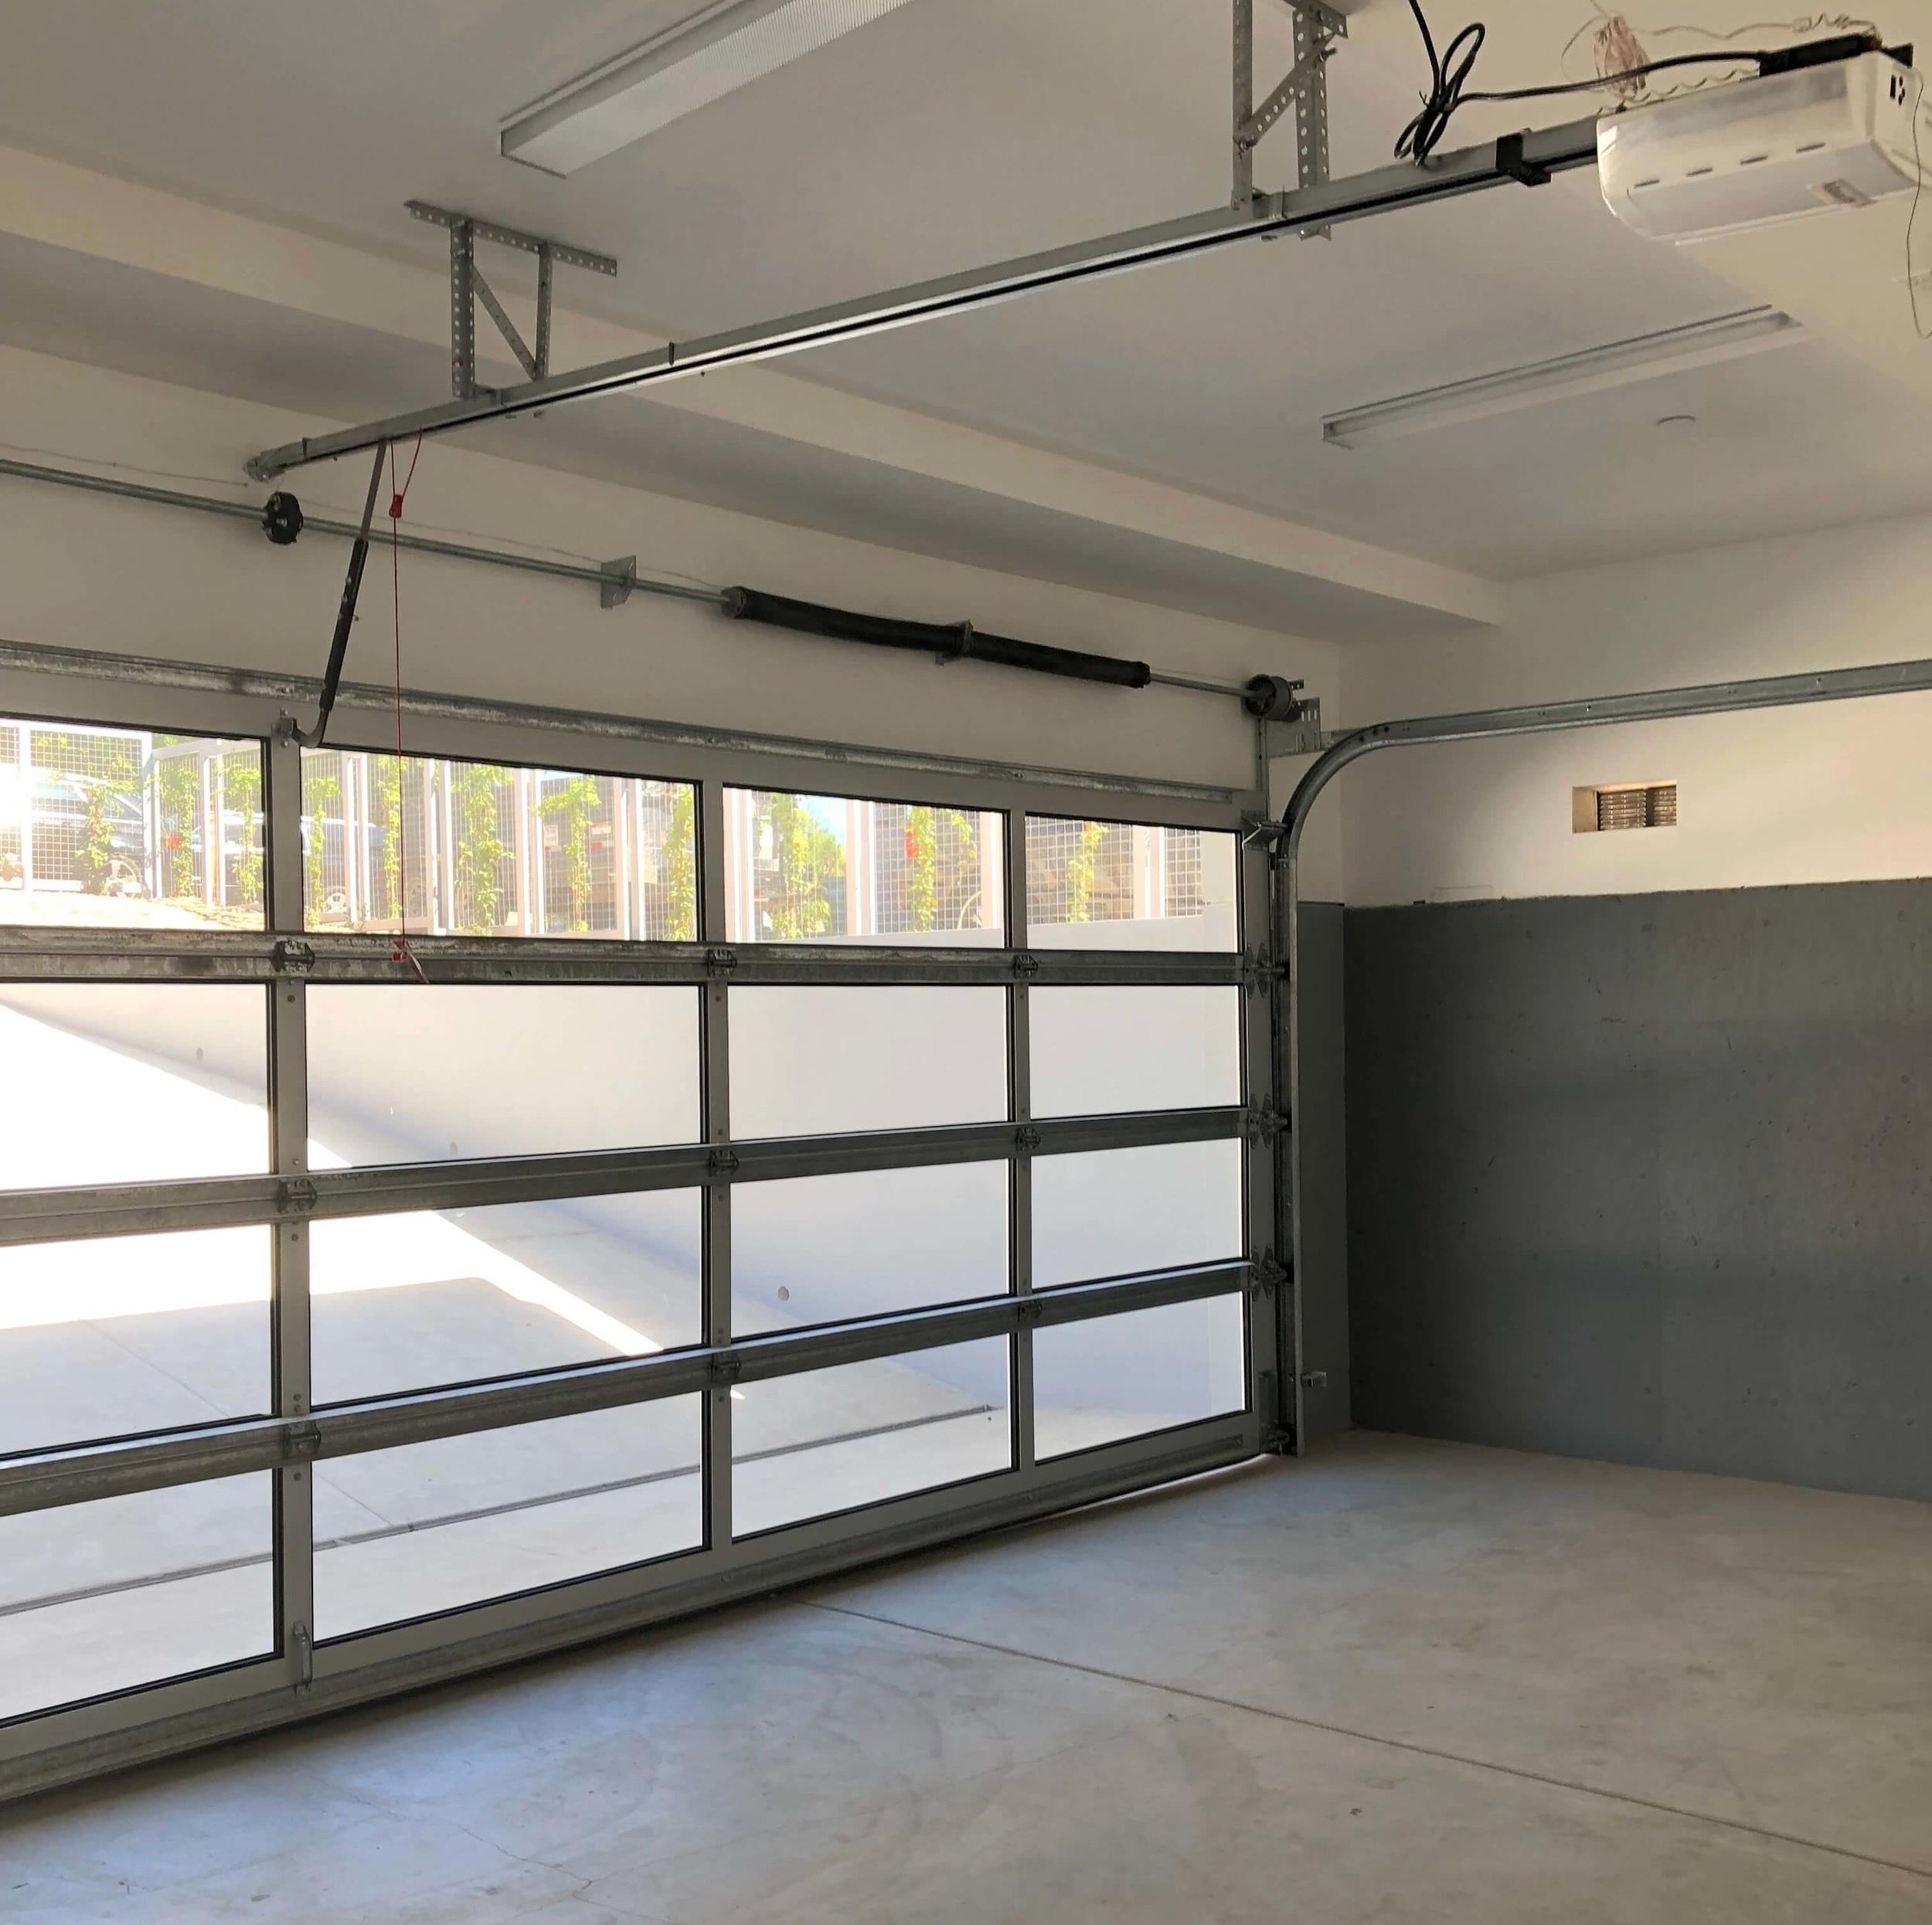 Garage, below the patio, with glass door, gray painted interior |California contemporary design - Dwell on Design's Malibu Home Tour, Designer: Vitus Mitare #contemporaryarchitecture #garage